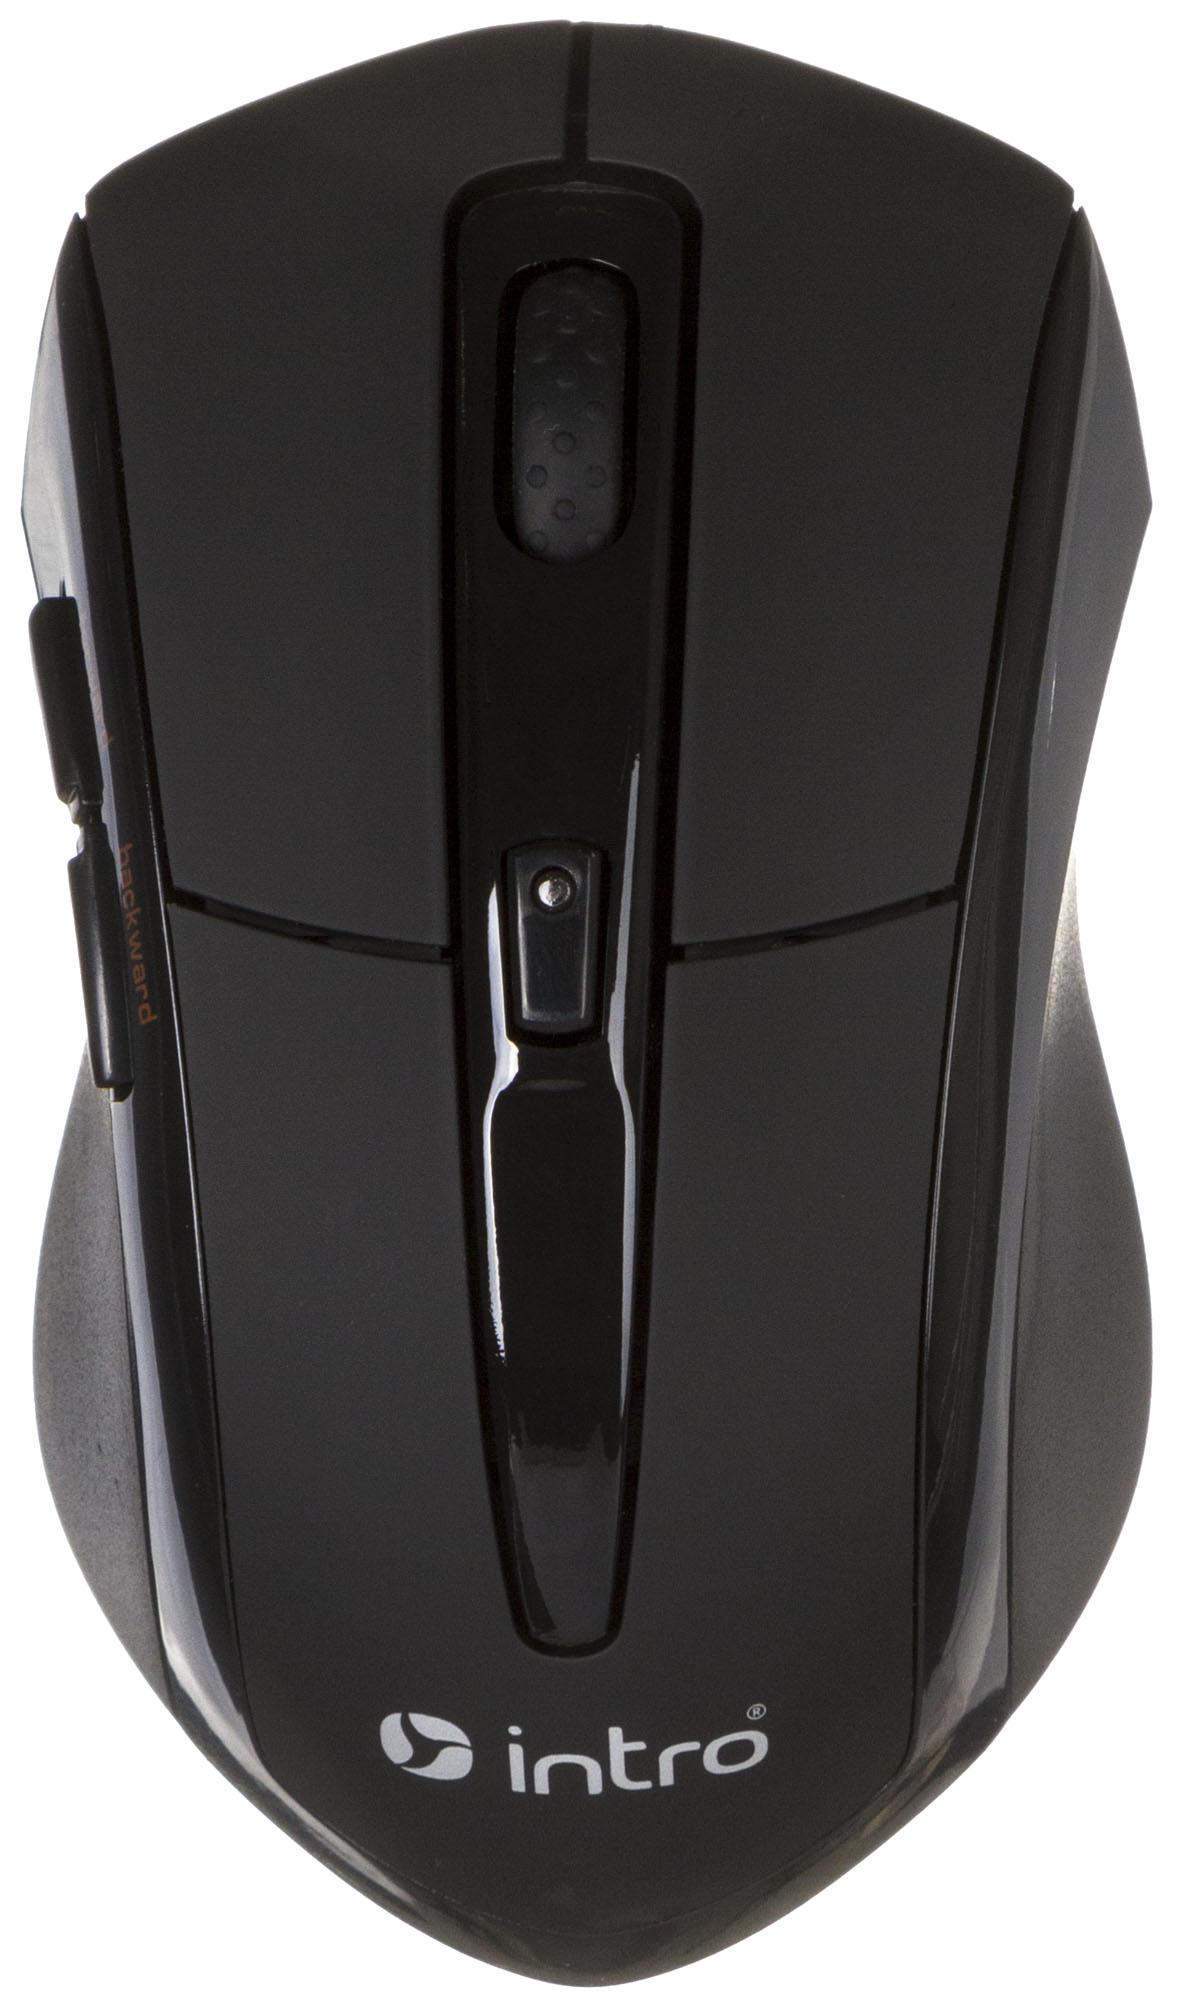 Компьютерная мышь Intro MW207 mouse Wireless Black USBКомпьютерные мыши<br><br>